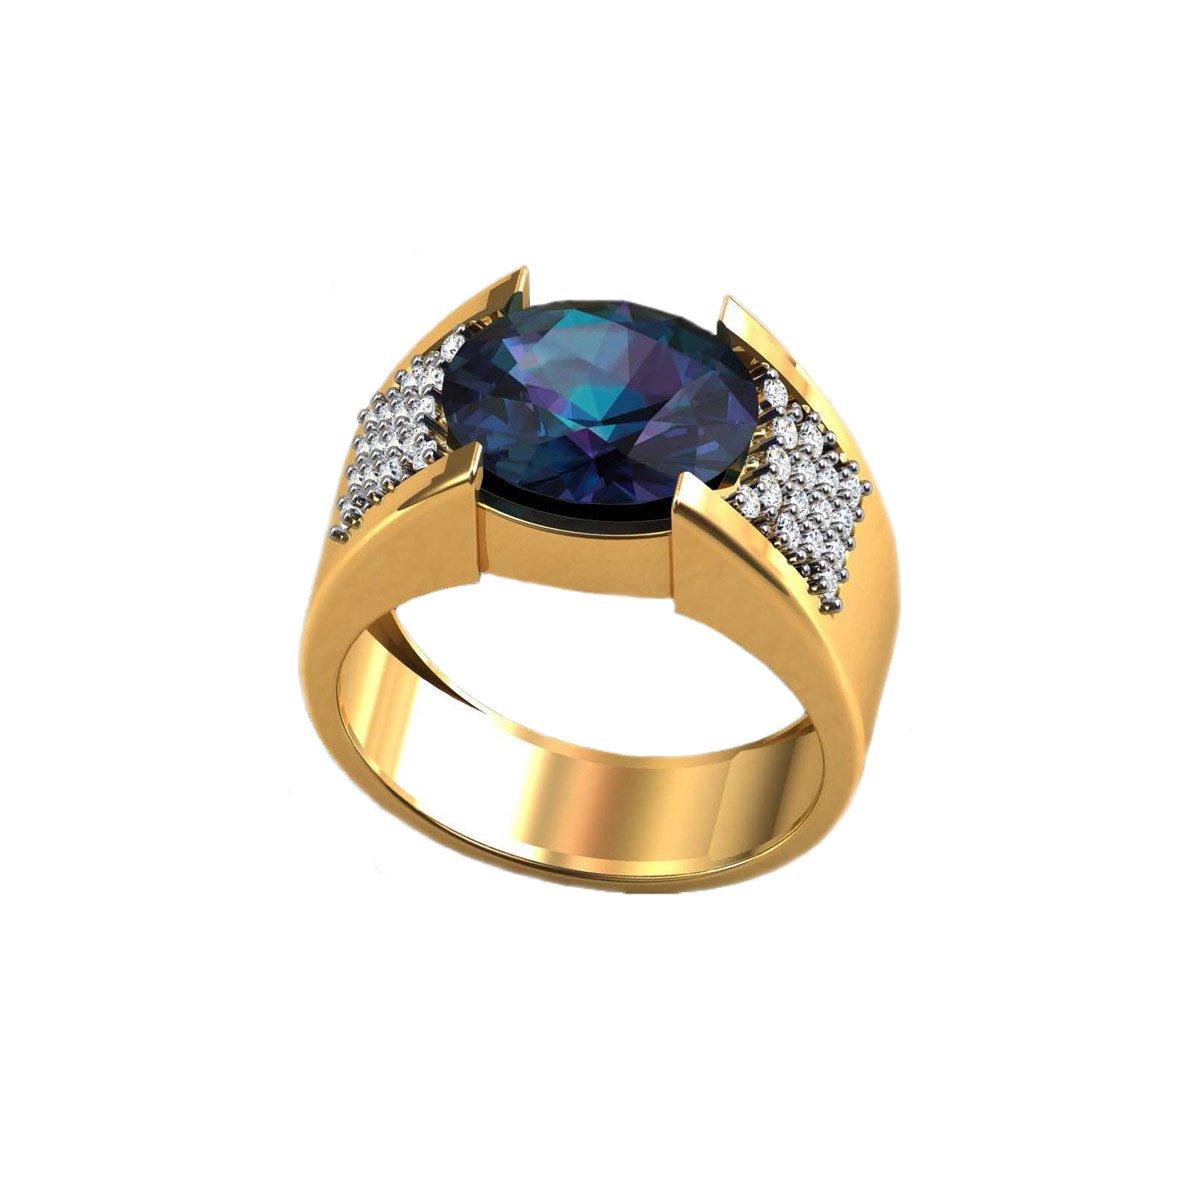 Shani Gold Ring